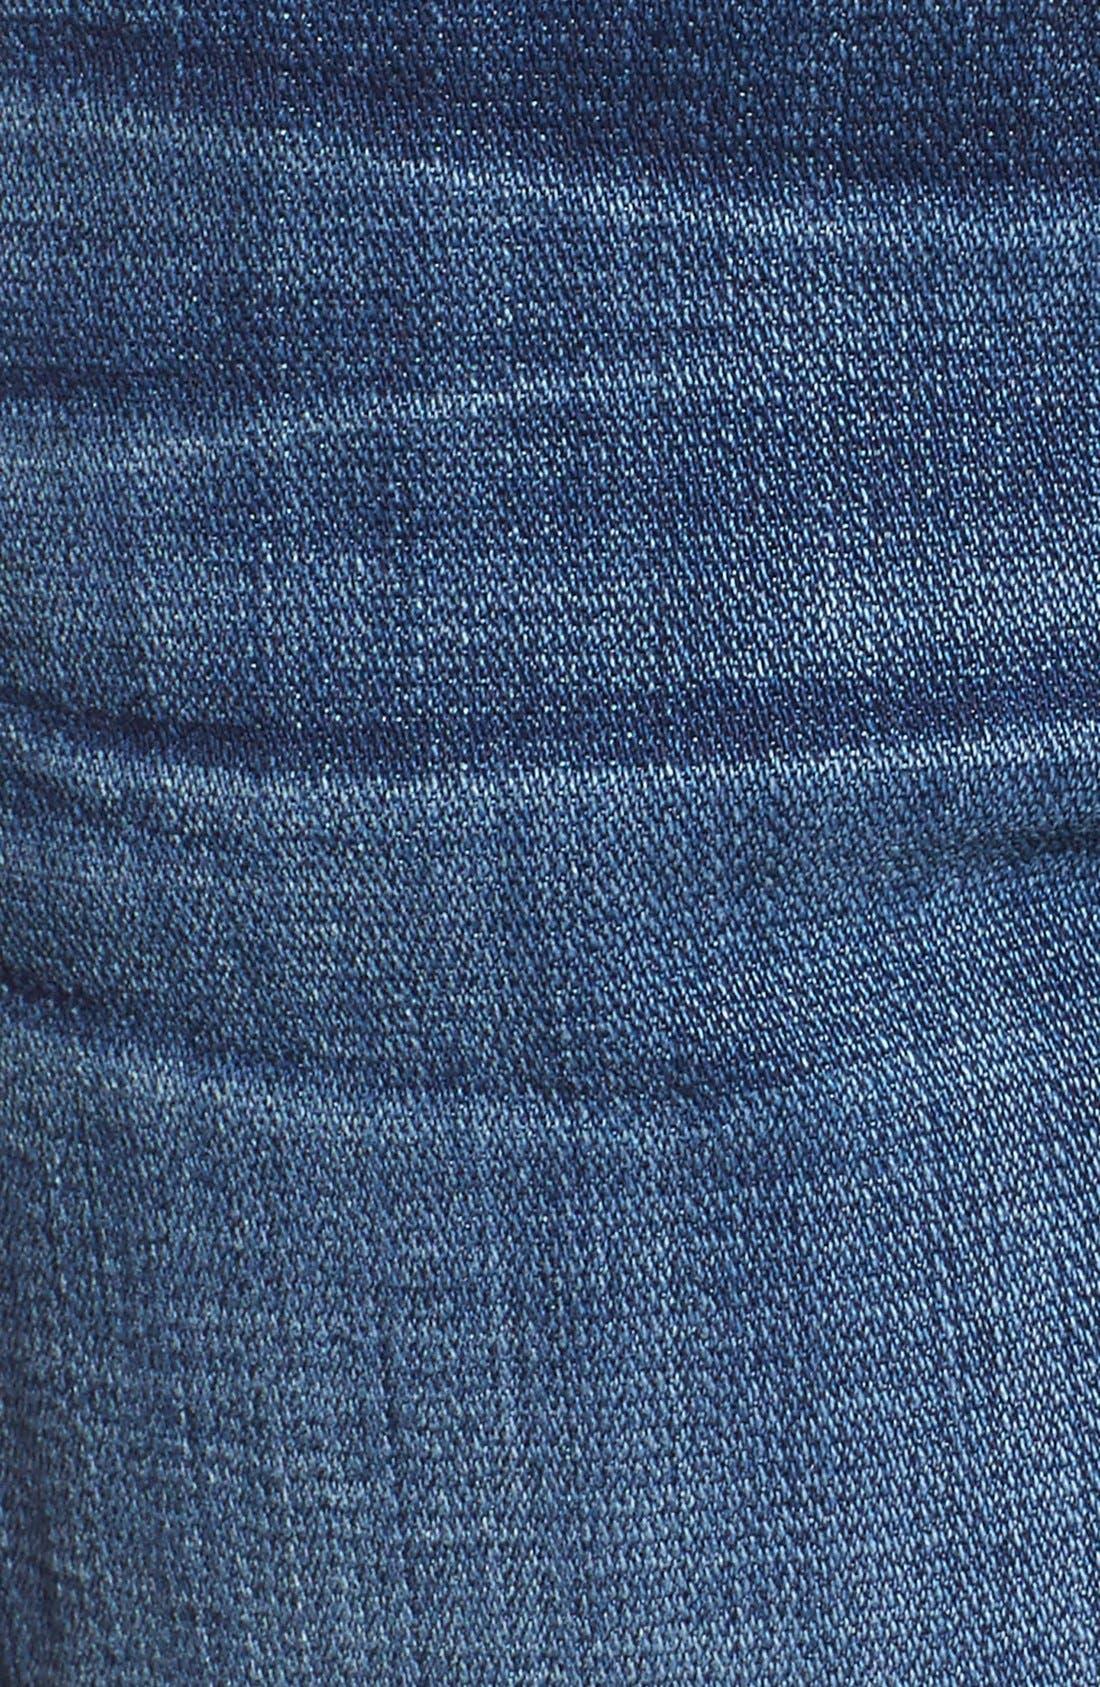 Relaxed High Rise Denim Shorts,                             Alternate thumbnail 3, color,                             400